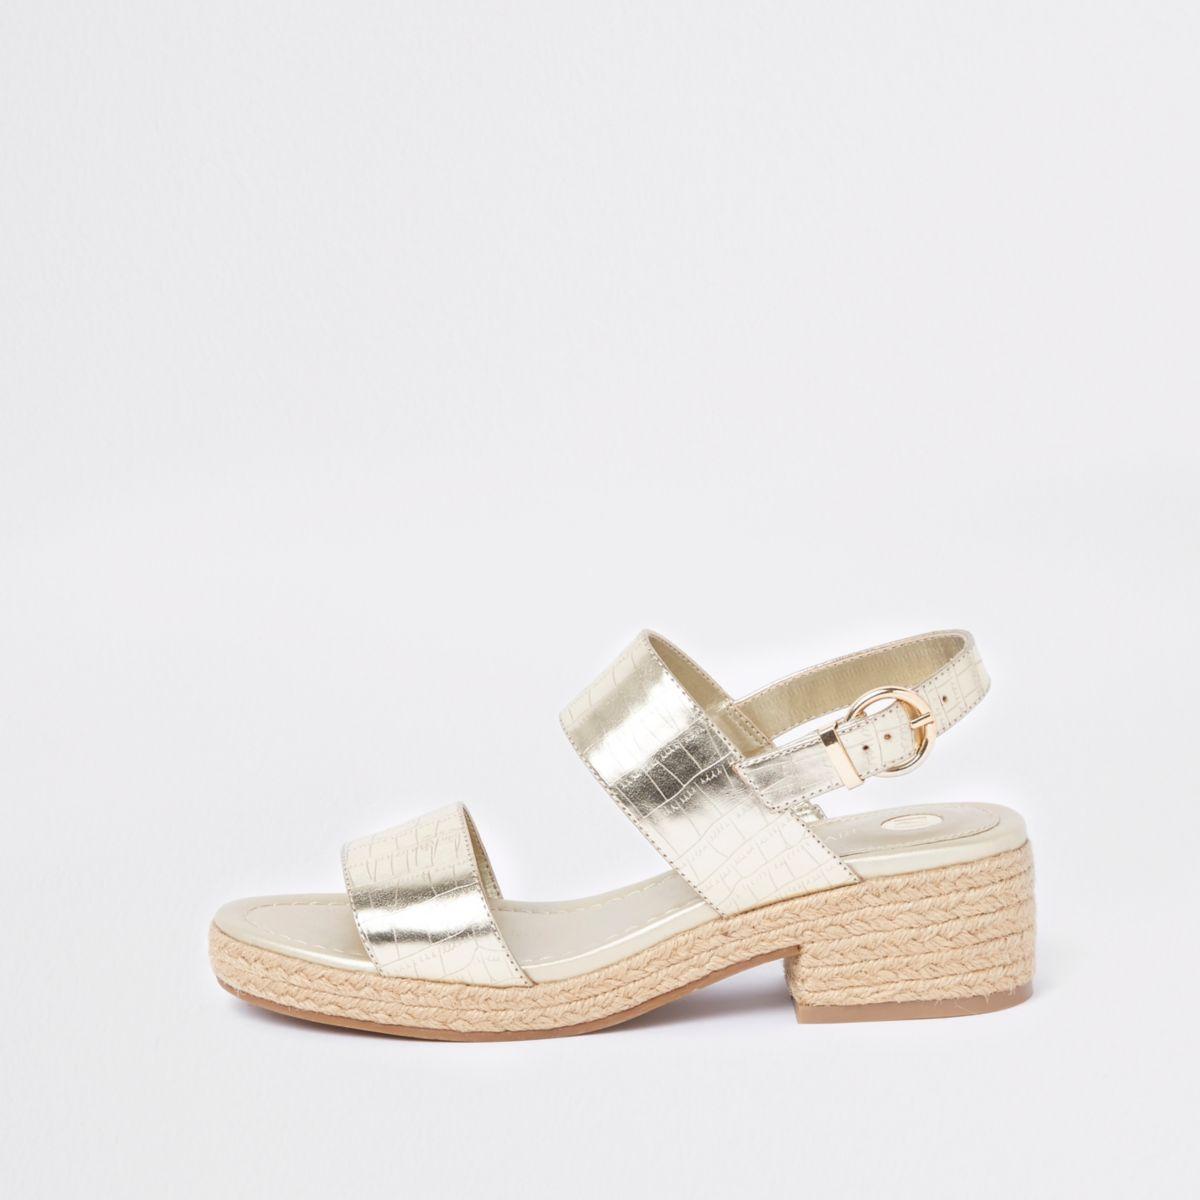 Gold metallic two part espadrille sandals